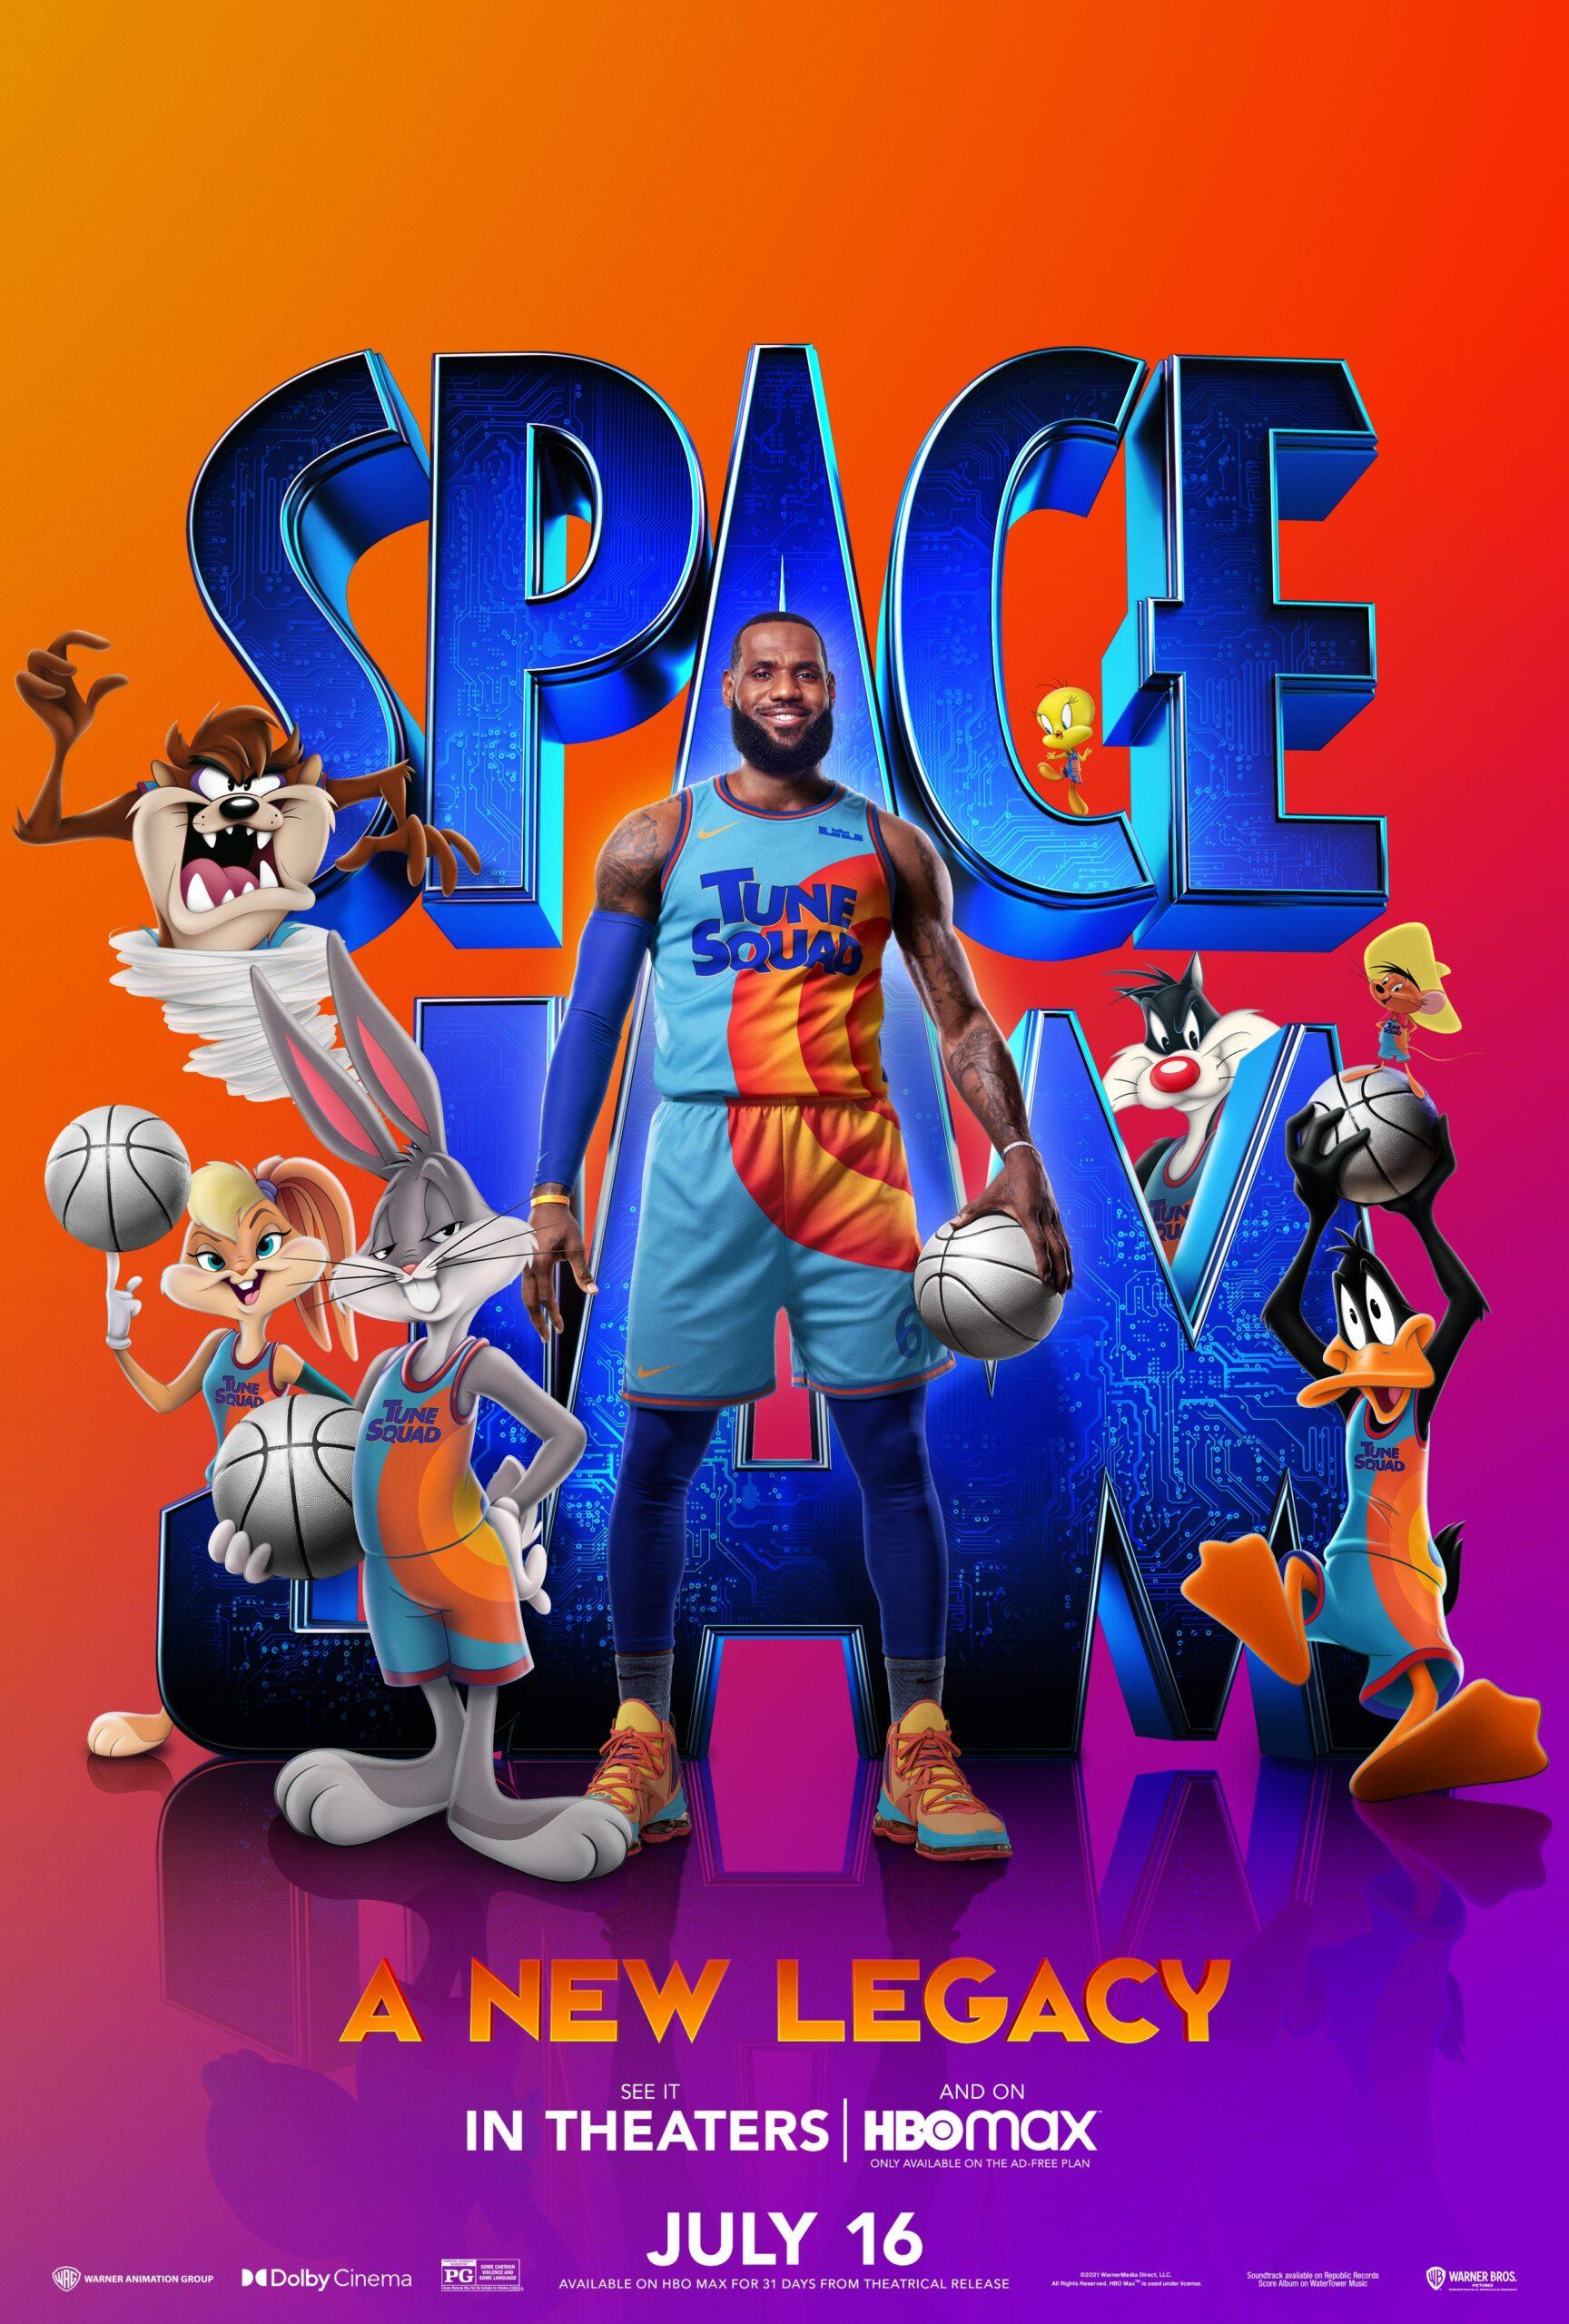 space-jam-a-new-legacy-SJAM2_VERT_Standing_Color_2764x4096_DOM_rgb